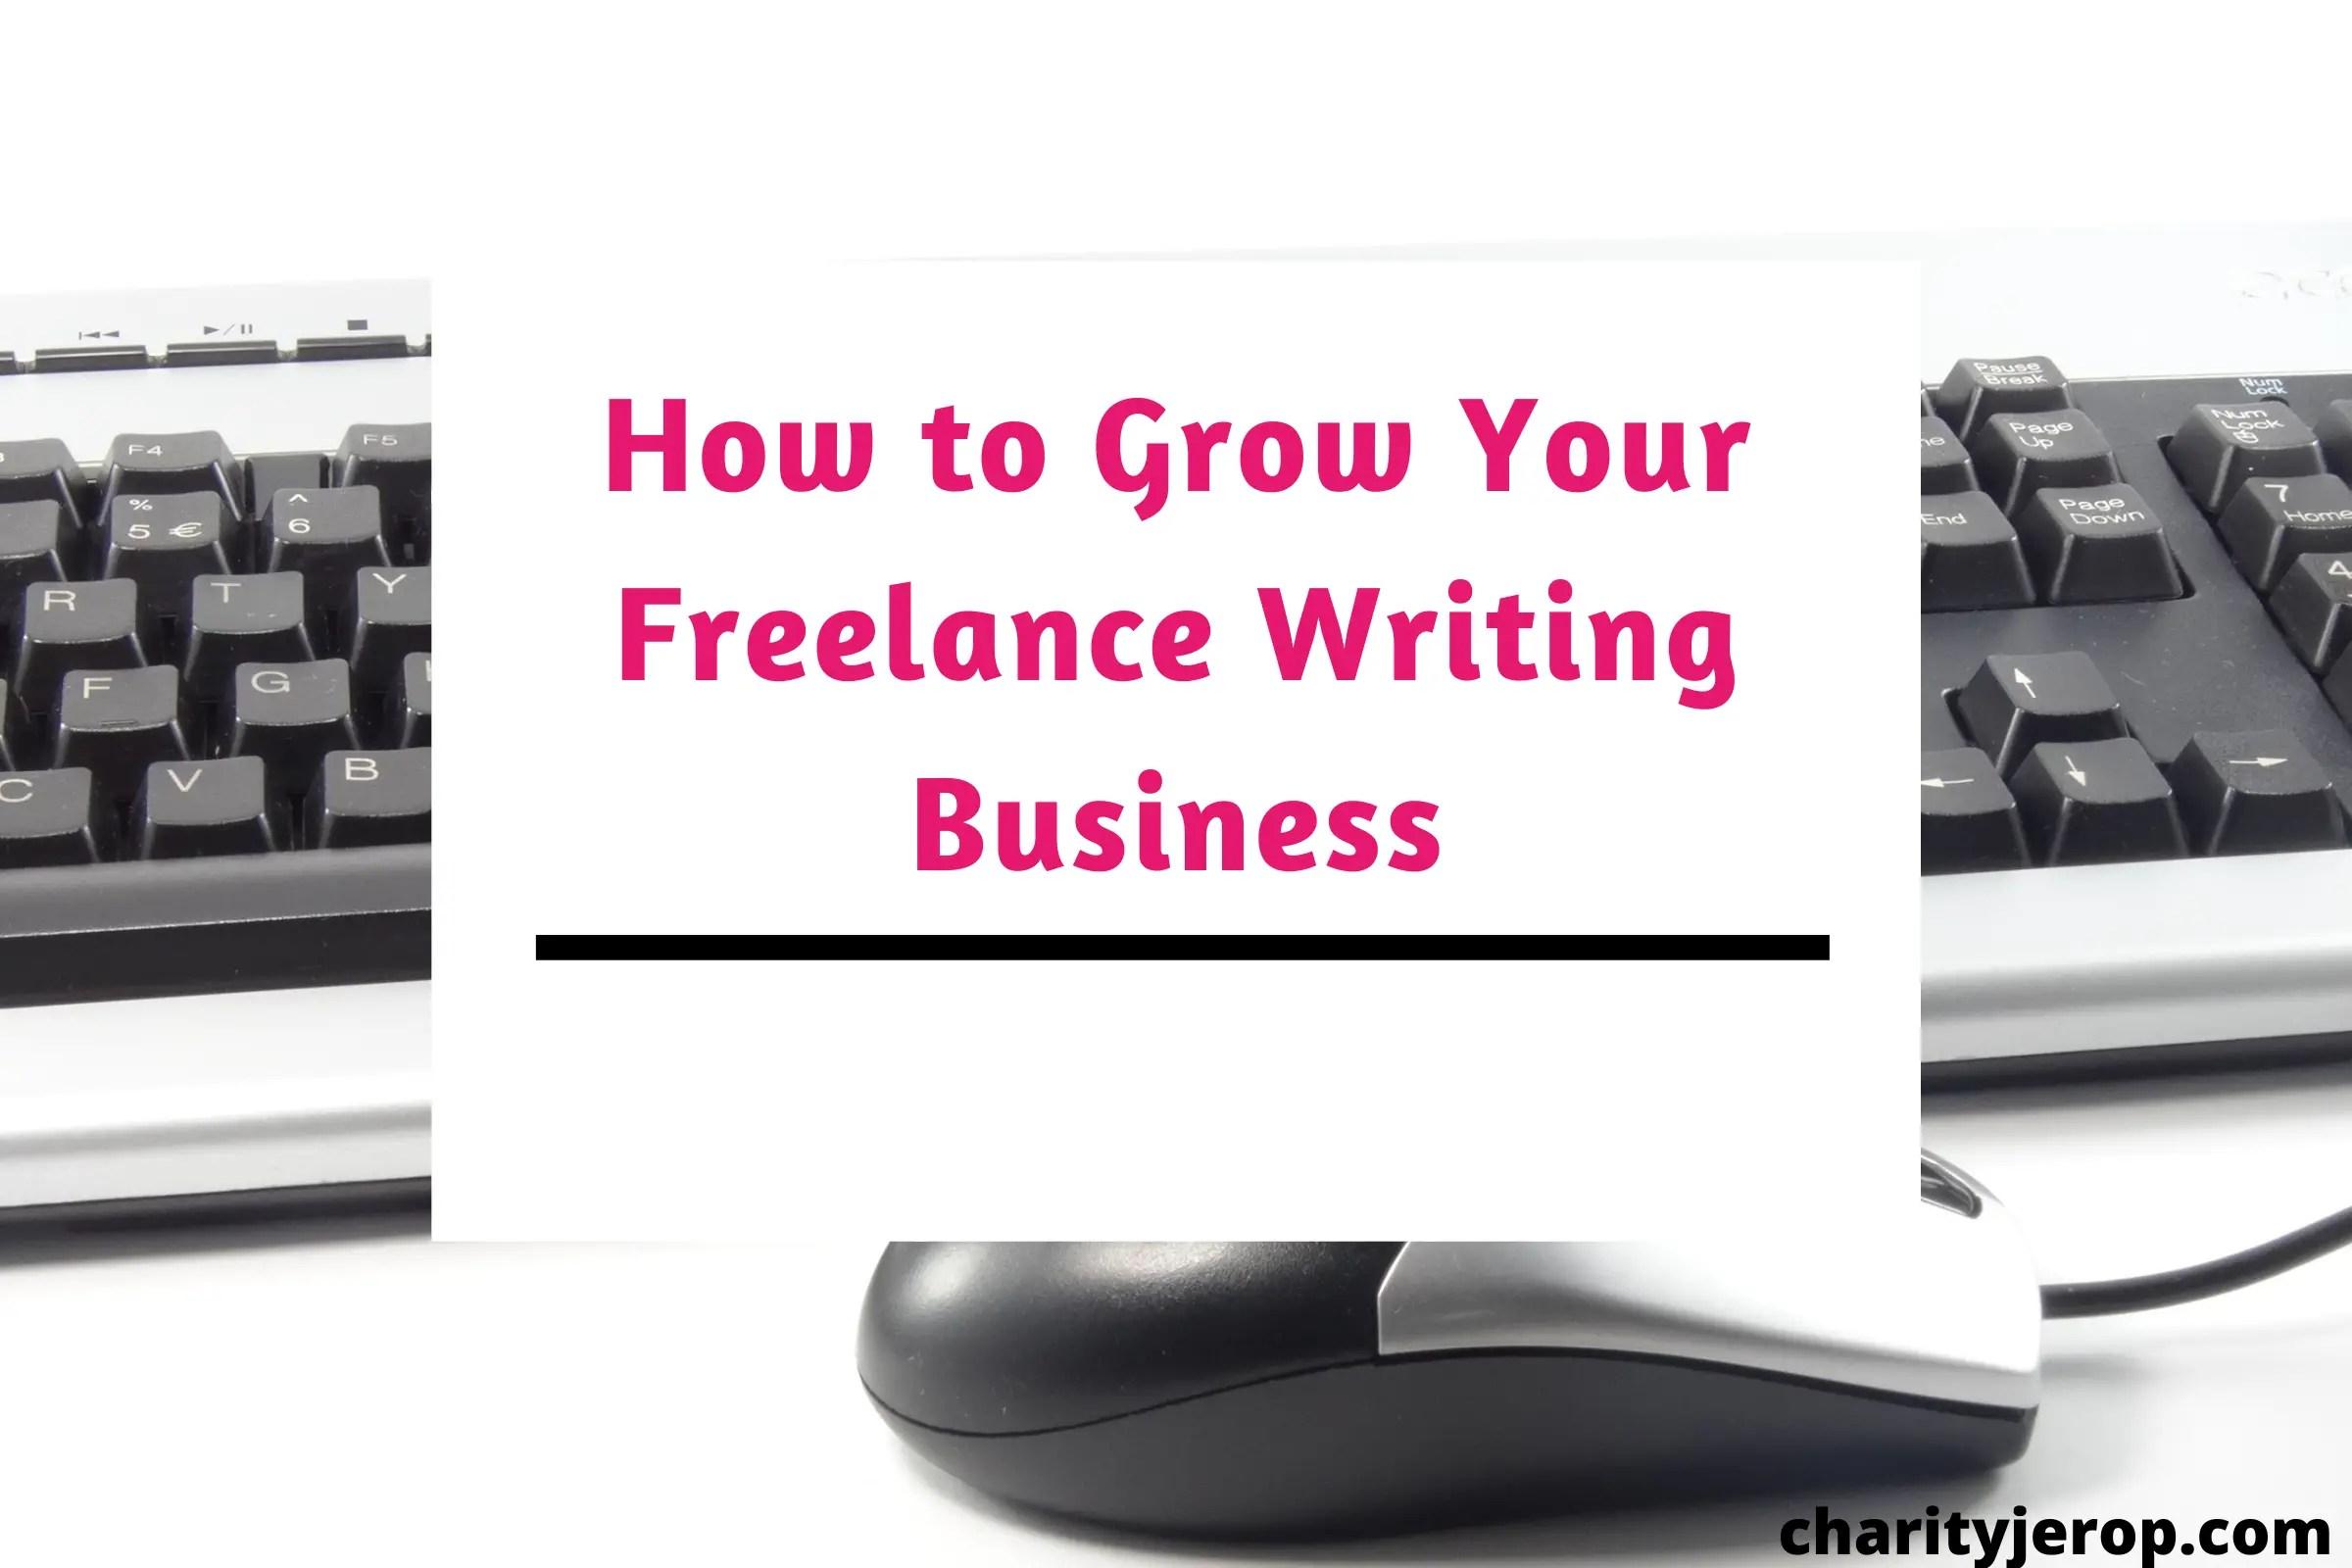 Ho do i grow my freelance writing career?